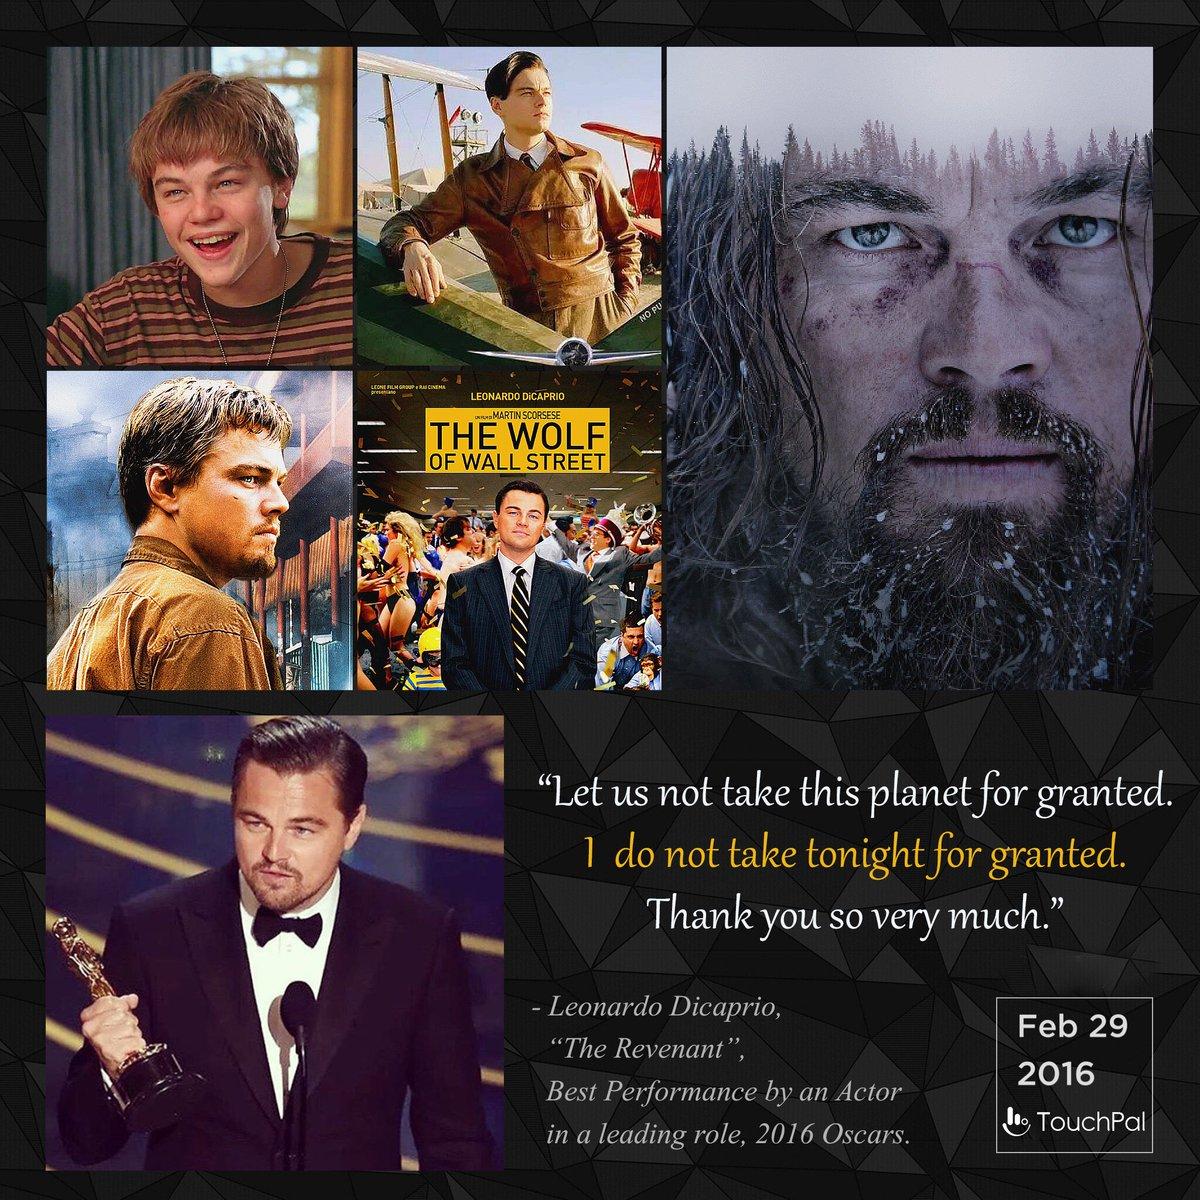 Big congrats to Leonardo DiCaprio, great actor and environmentalist! #Leo #LeonardoDiCaprio #Oscars https://t.co/tC4uAvOaBg